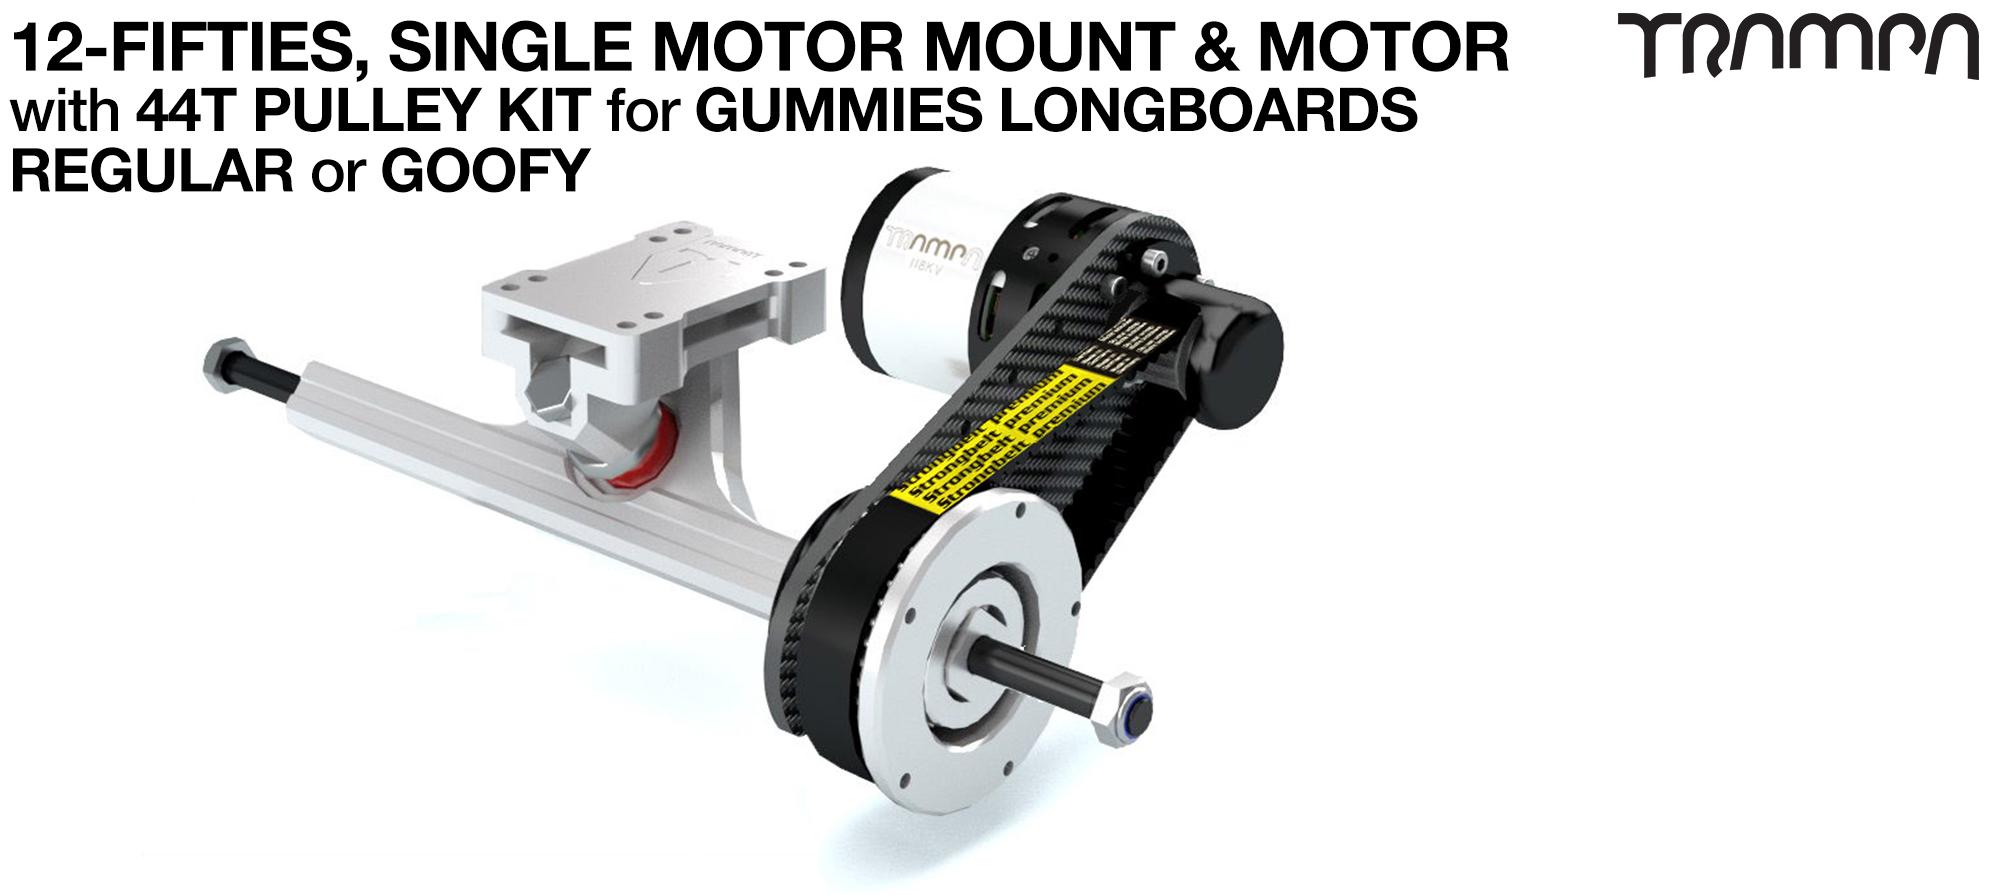 SINGLE Original 12FiFties Motor mount & 44 Tooth Pulley Kit with MOTOR & 2x 12FiFties Trucks